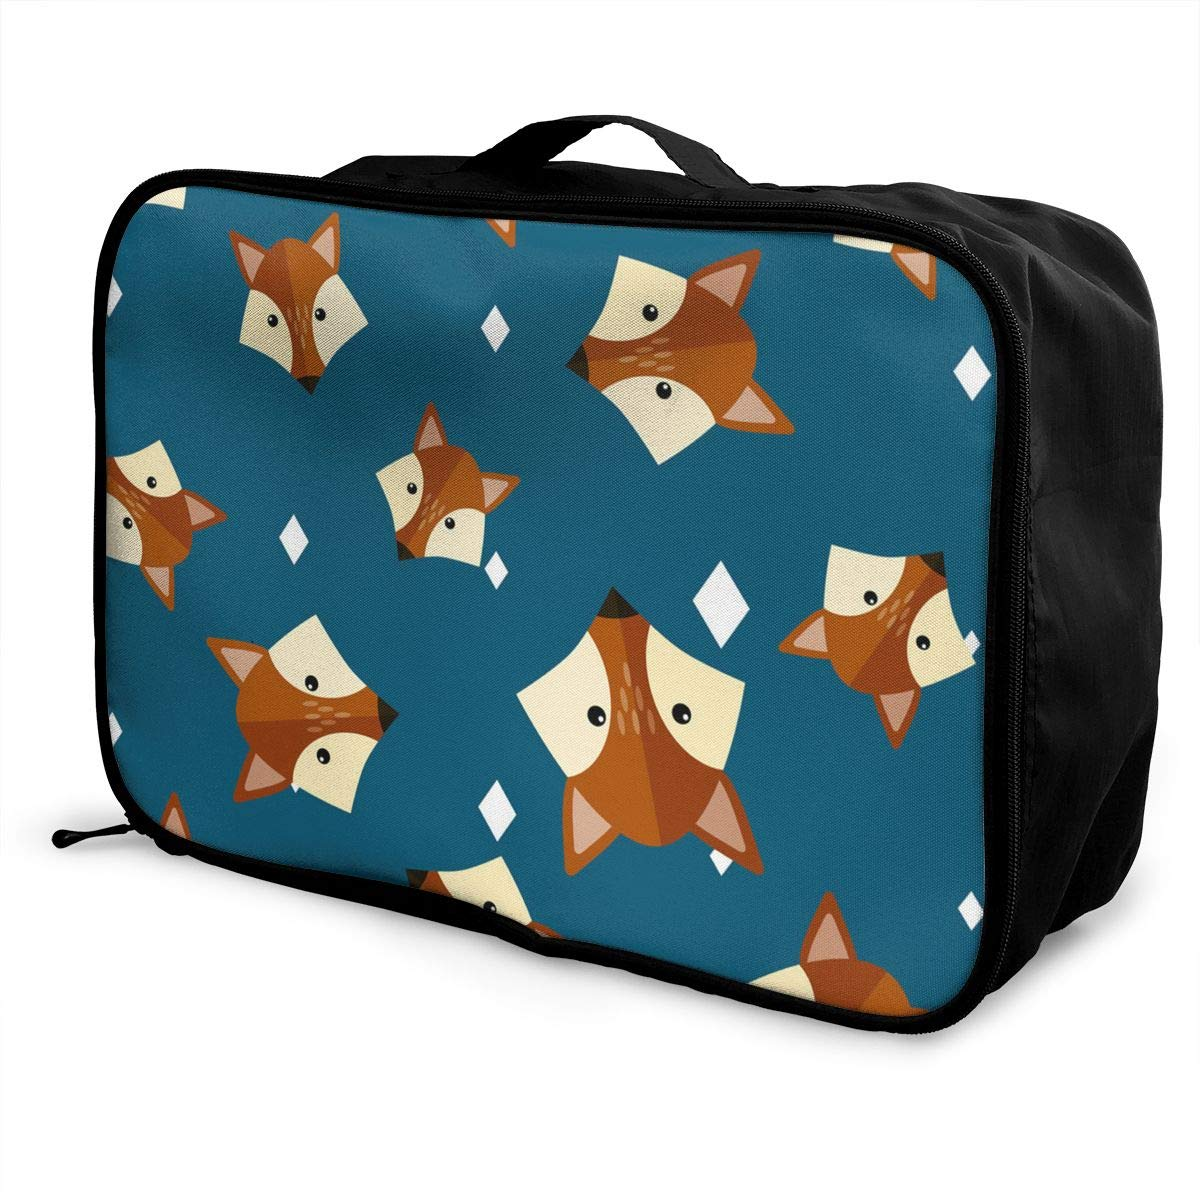 ADGAI Cute Little Fox Head Canvas Travel Weekender Bag,Fashion Custom Lightweight Large Capacity Portable Luggage Bag,Suitcase Trolley Bag